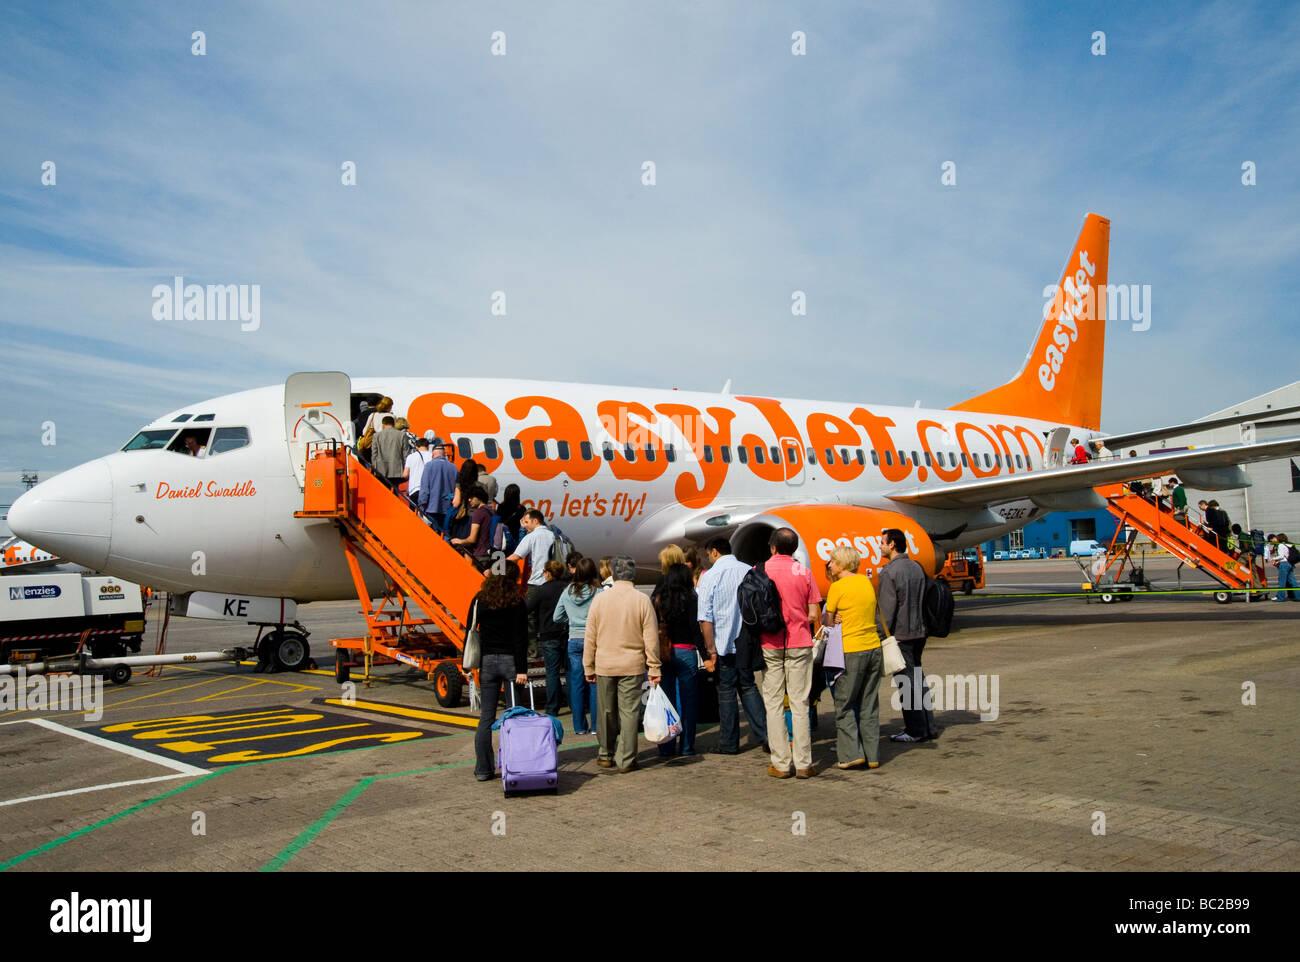 Passengers boarding an Easyjet plane - Stock Image